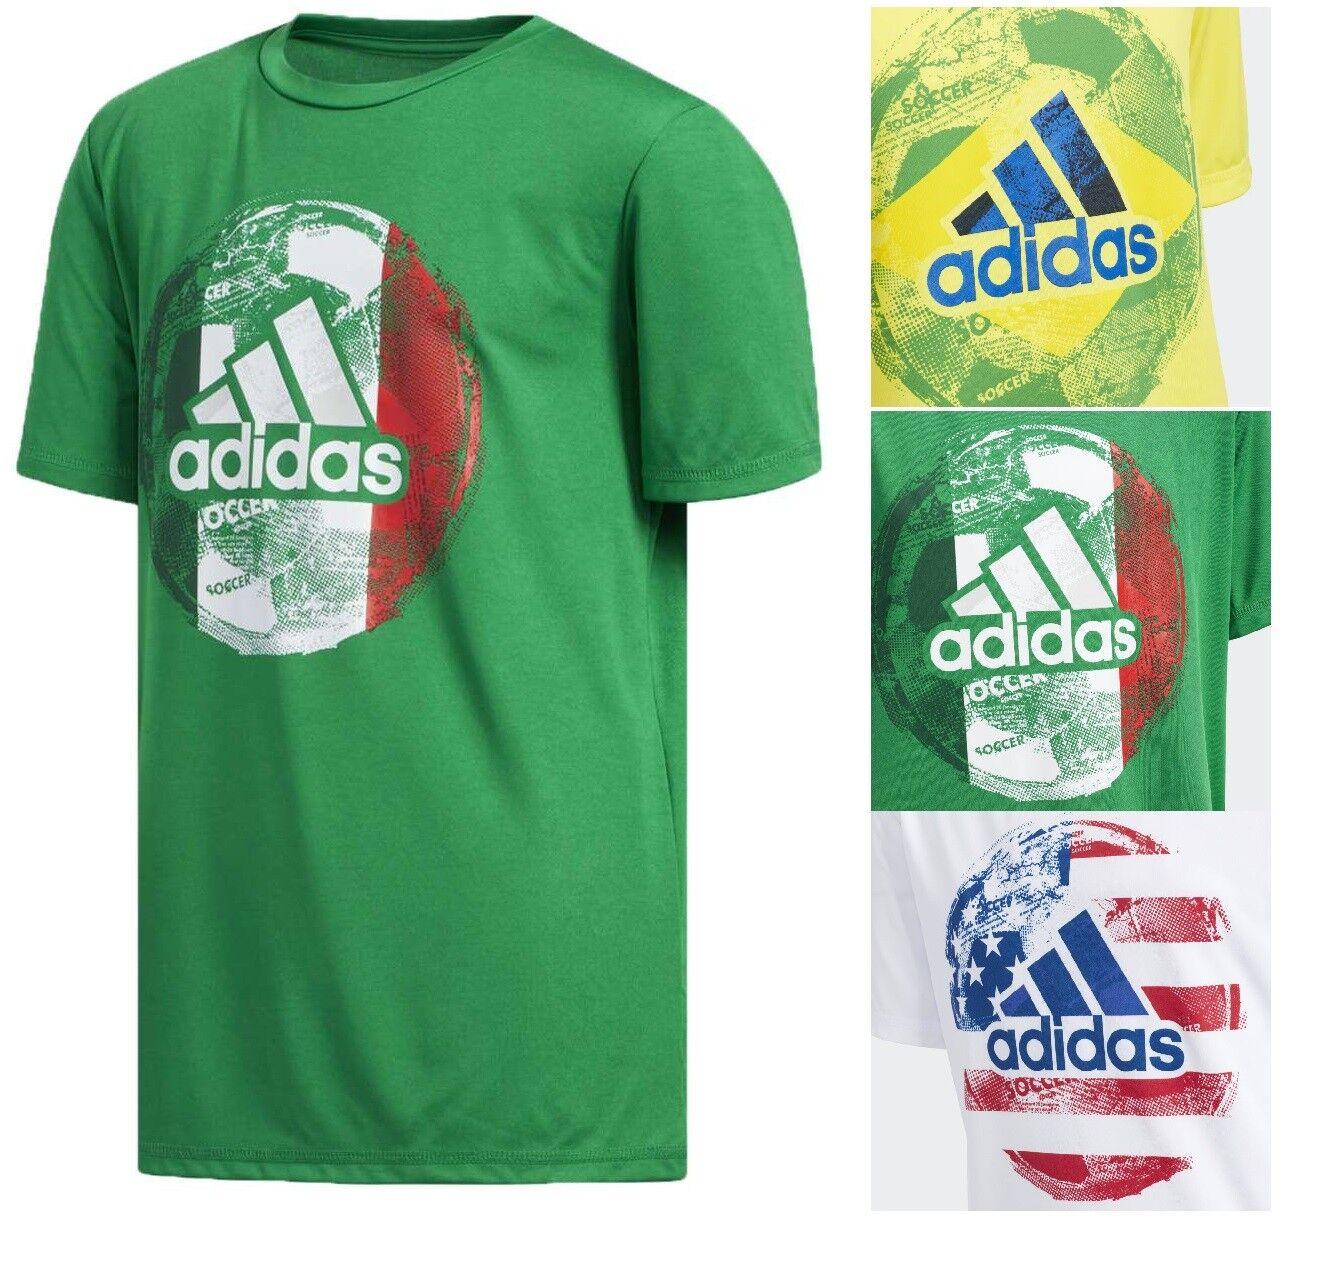 Adidas Boy's Kids NEW World Cup Soccer T-Shirt Crew Neck R